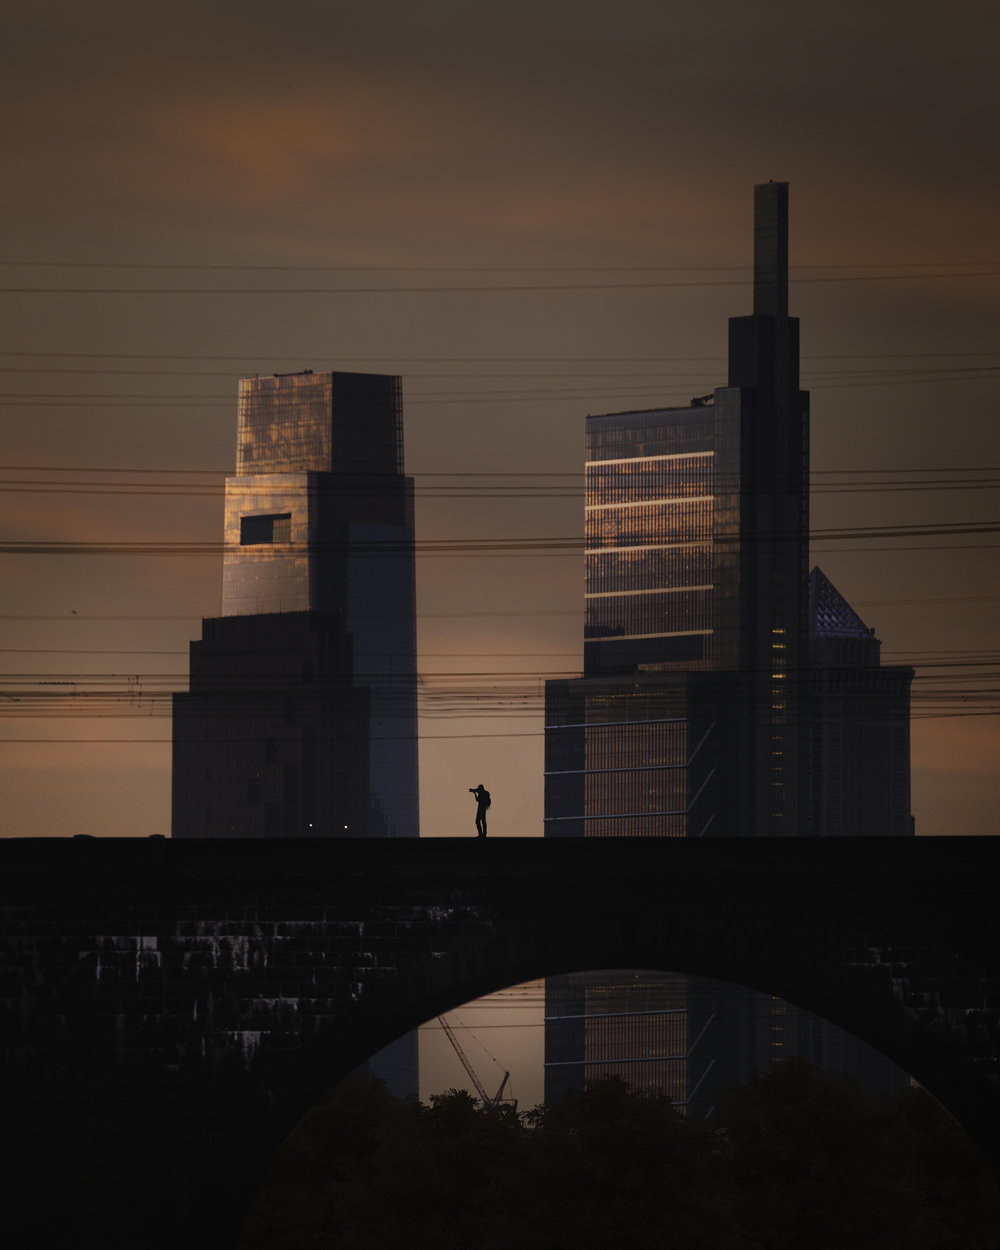 Fantasy Image of the Skyline of Philadelphia PA - Hythacg